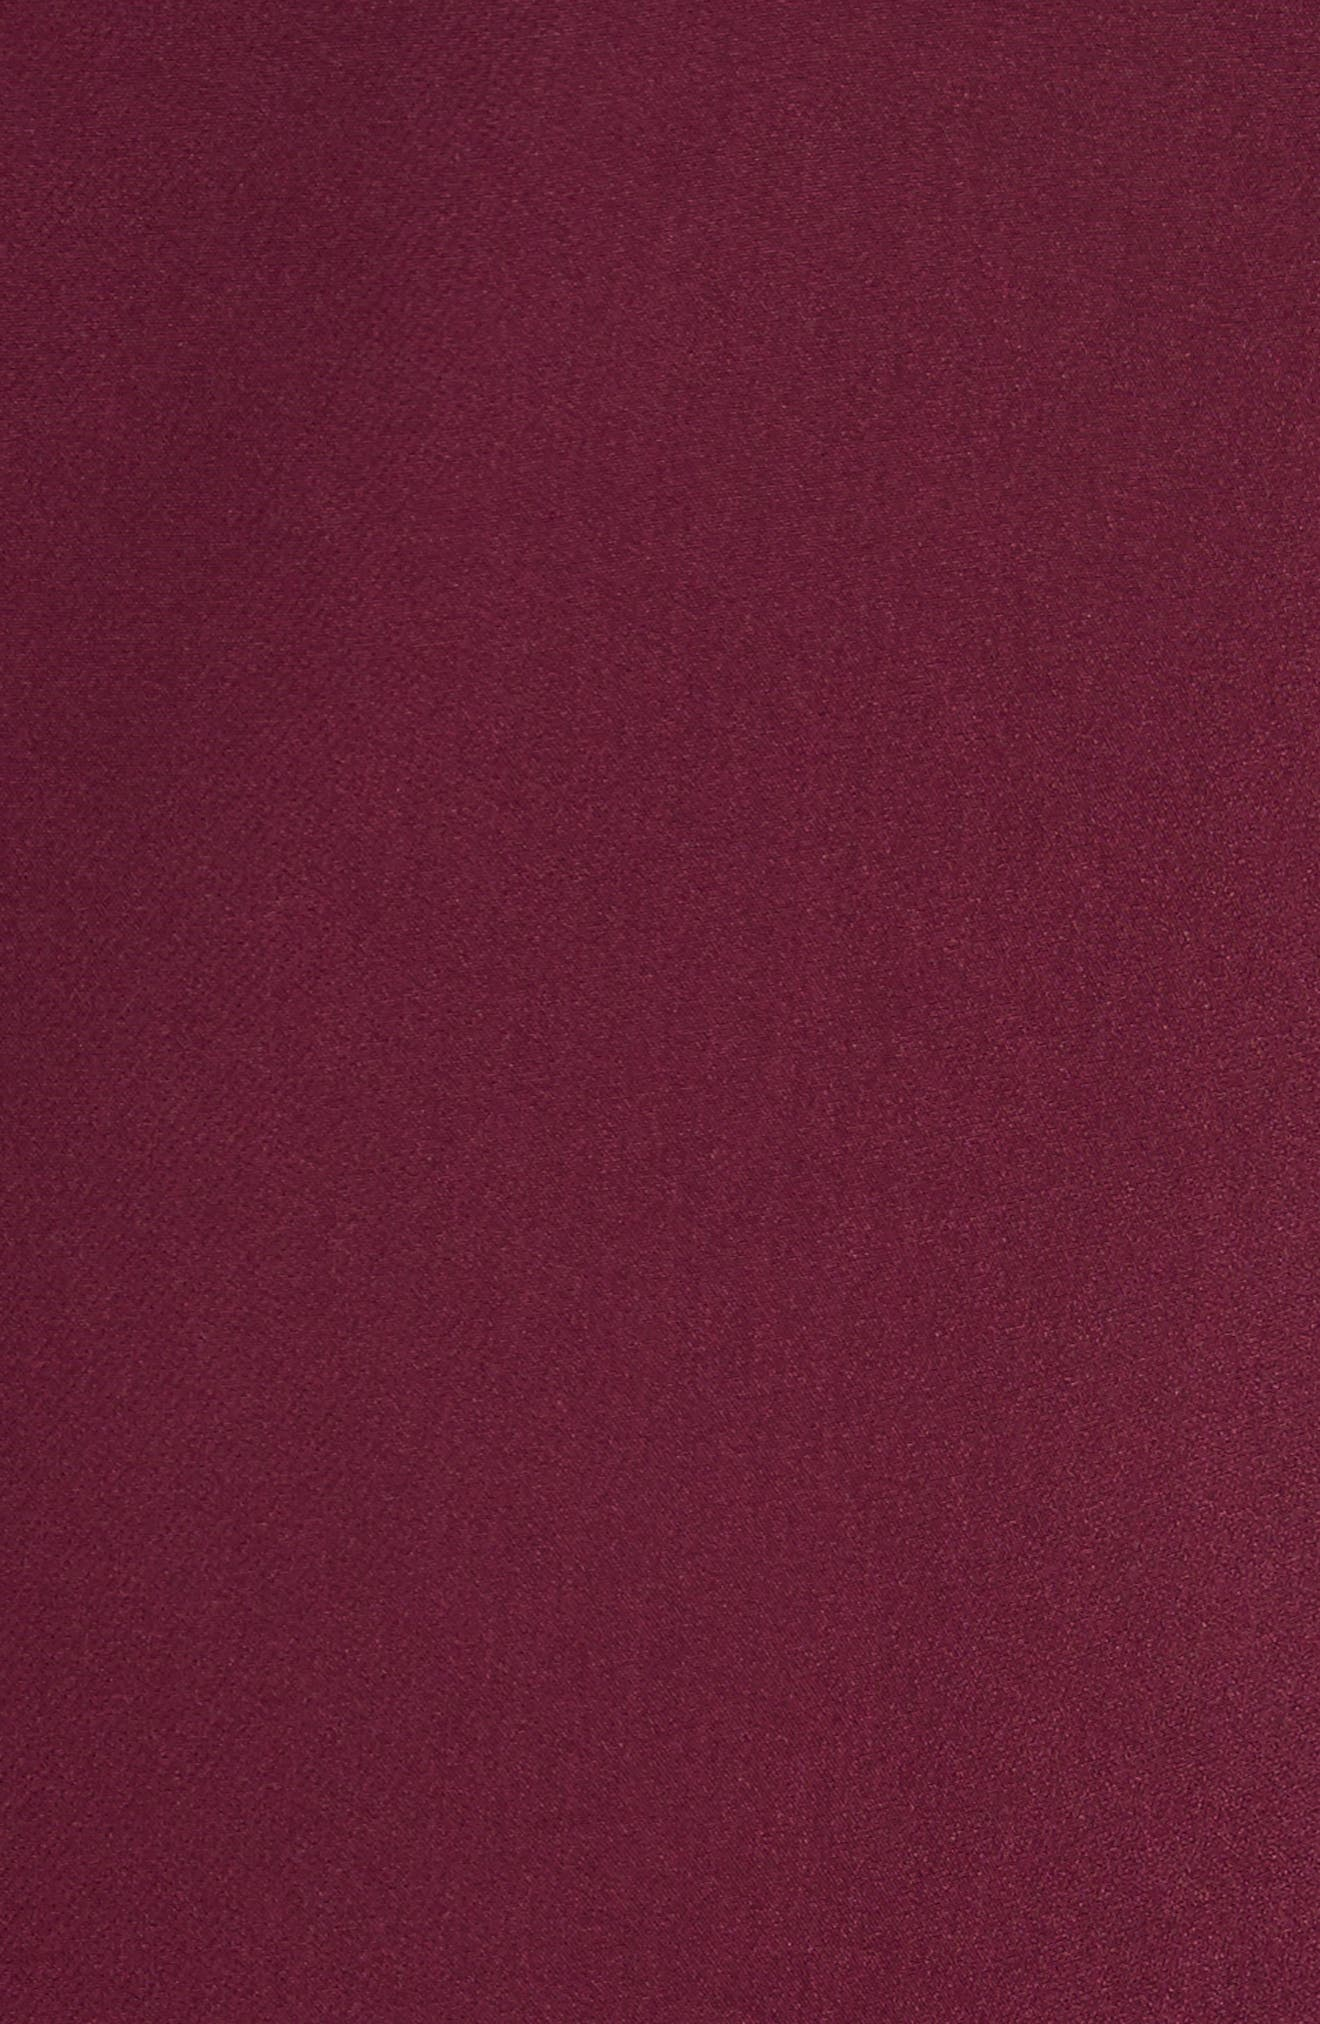 Nicole Bell Sleeve Dress,                             Alternate thumbnail 5, color,                             Burgundy